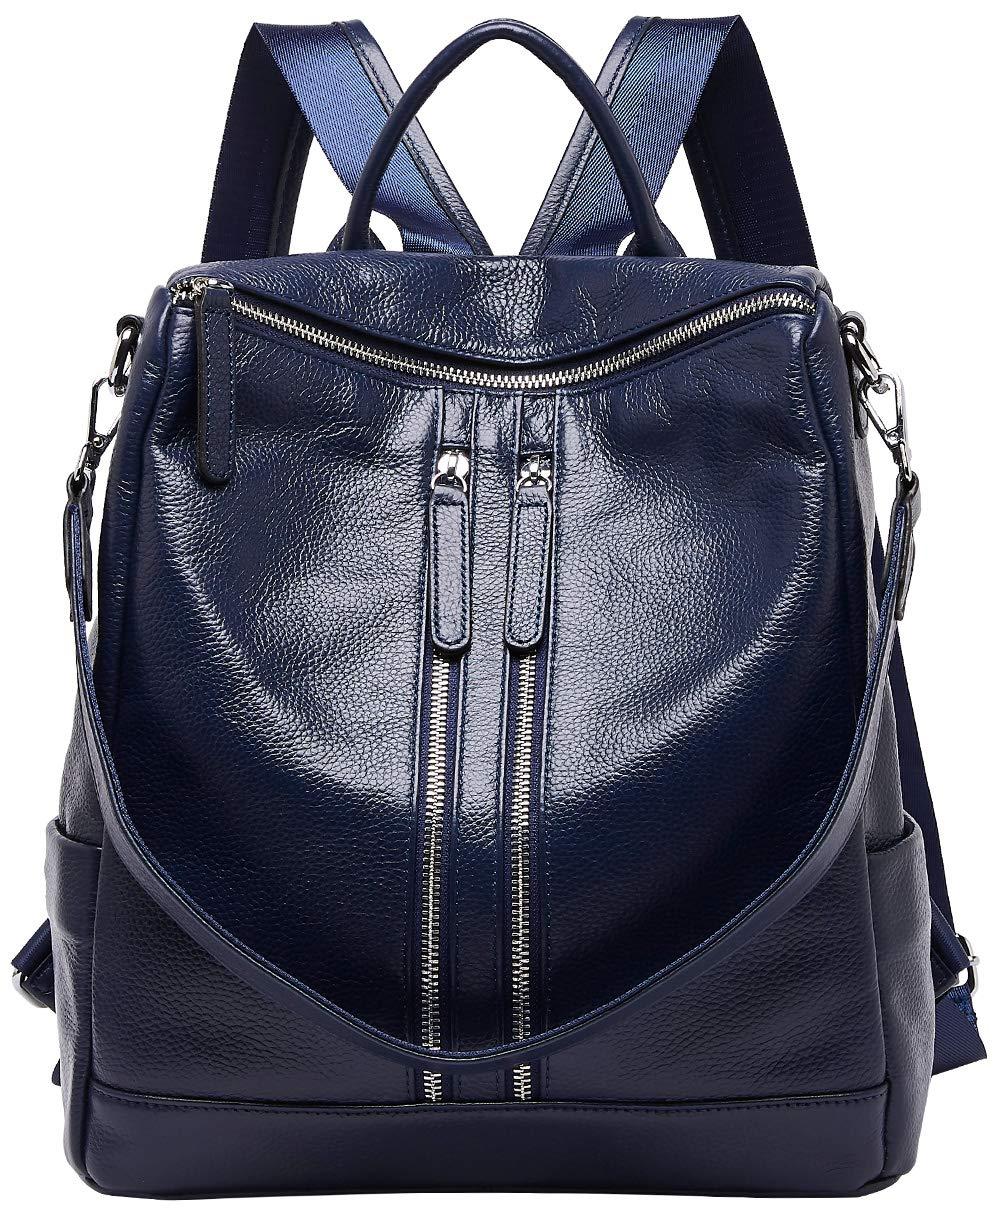 BOYATU Convertible Real Leather Backpack Purse for Women Travel Bag Fashion School Bag (Black-02) 71752